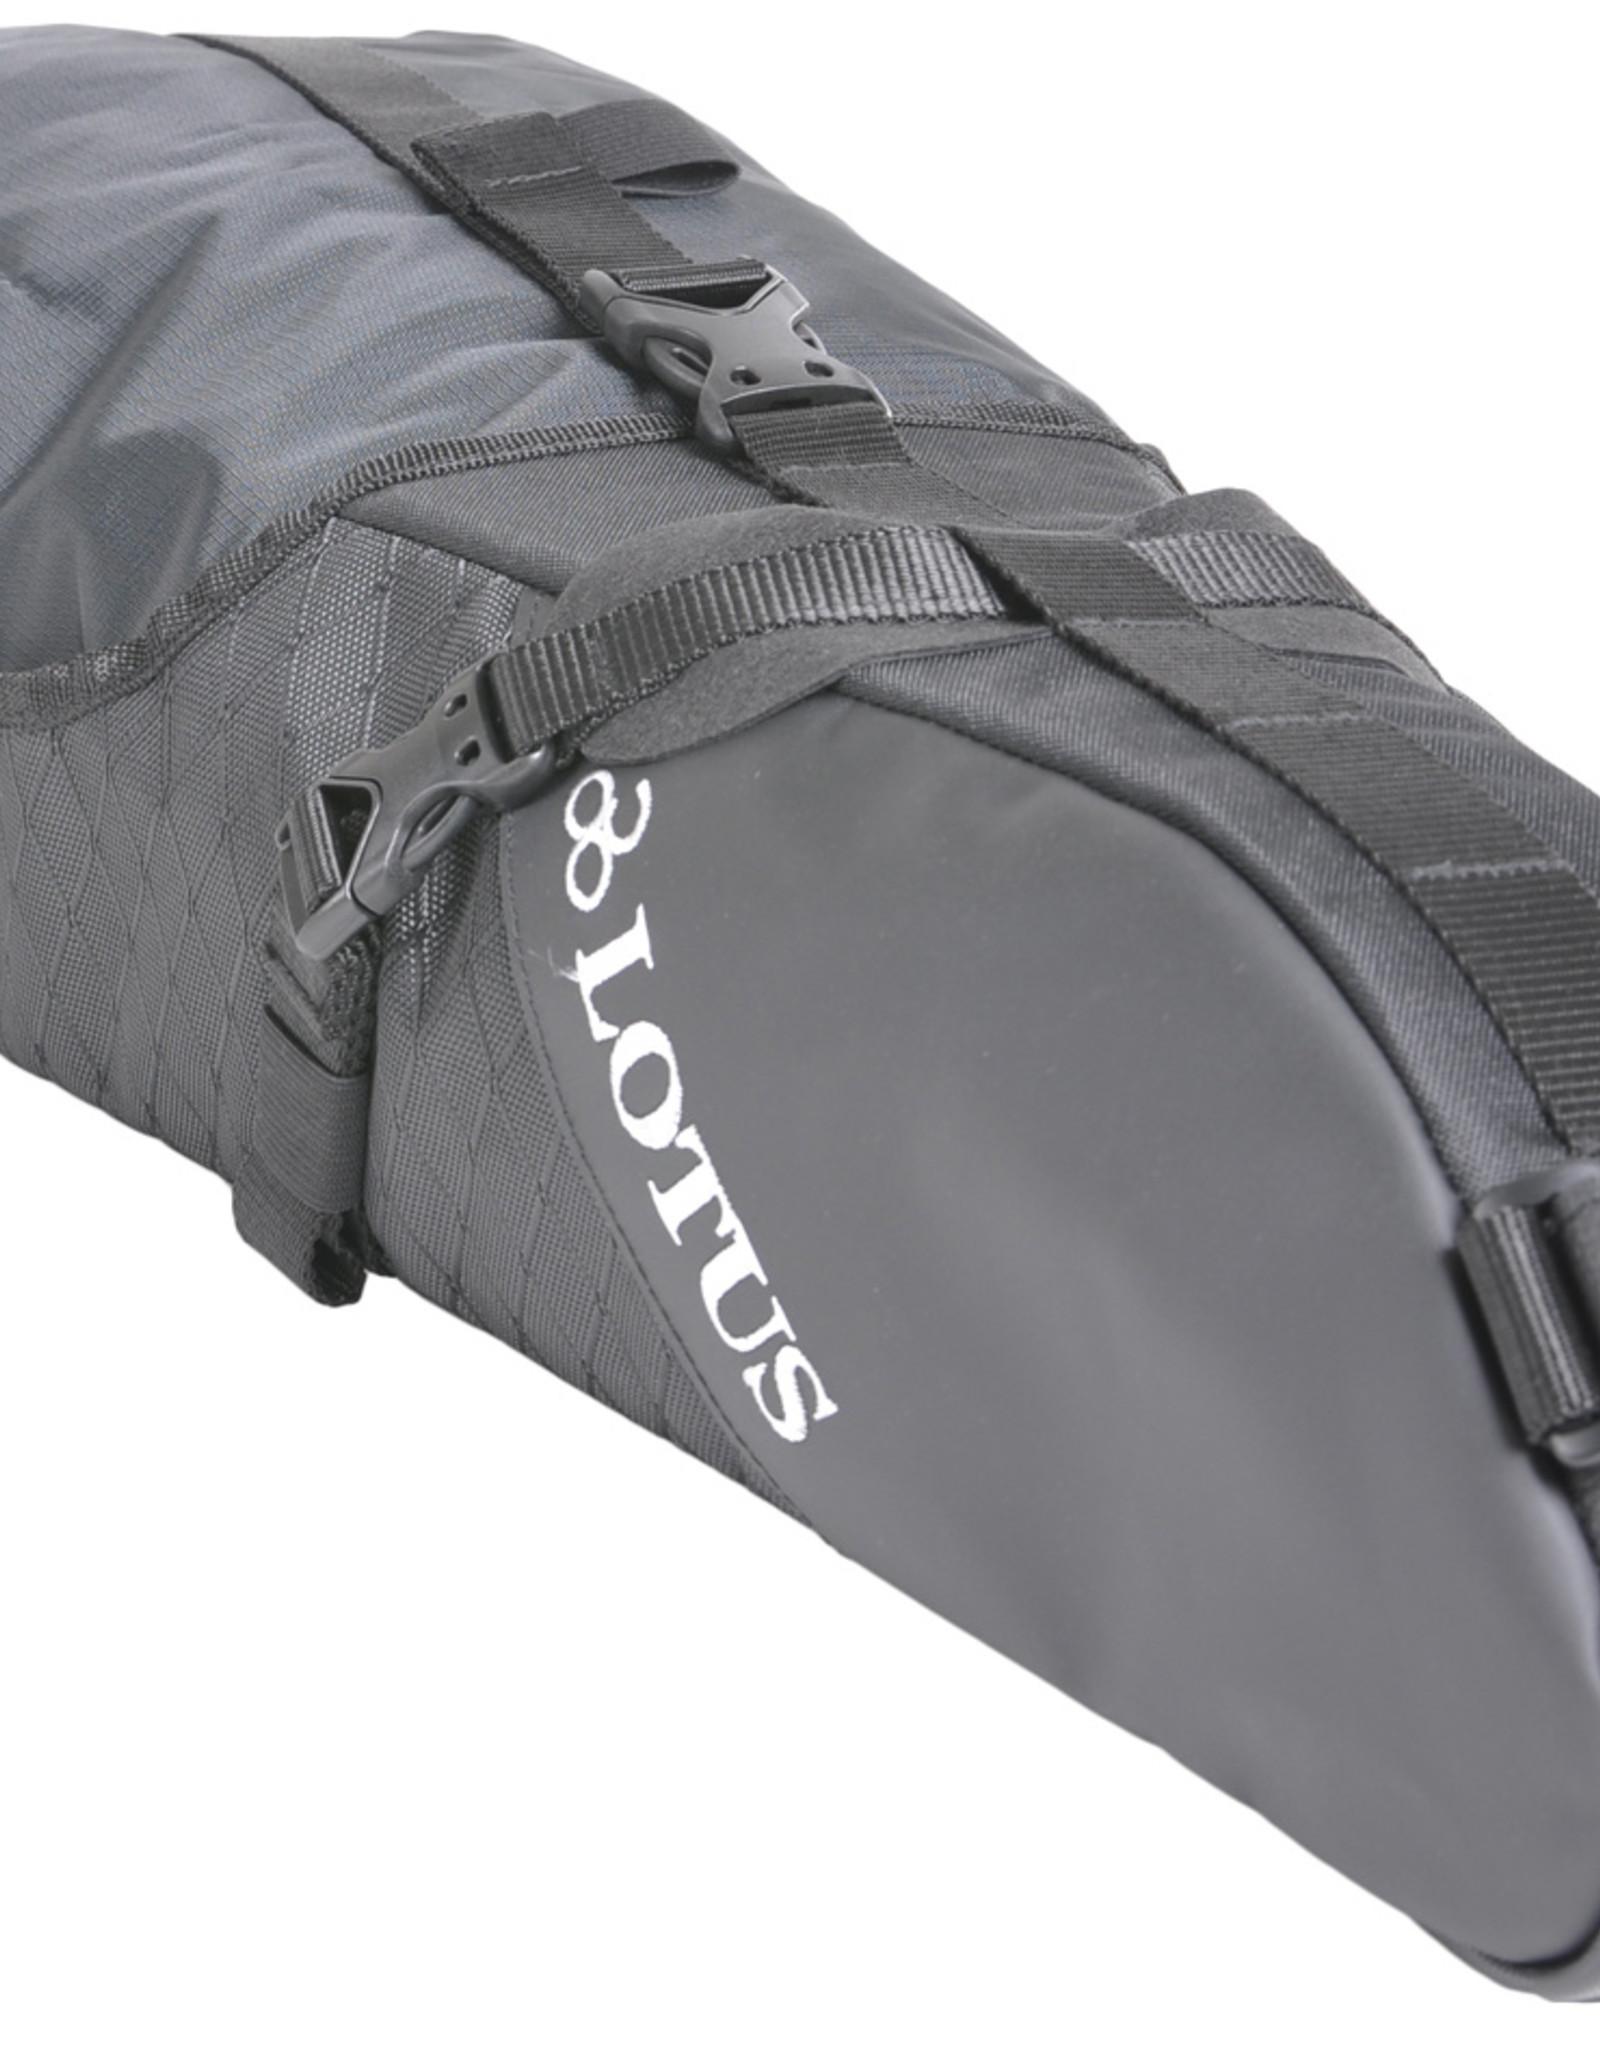 Lotus Tough Series TH7-7704 Saddlebag & Dry Bag